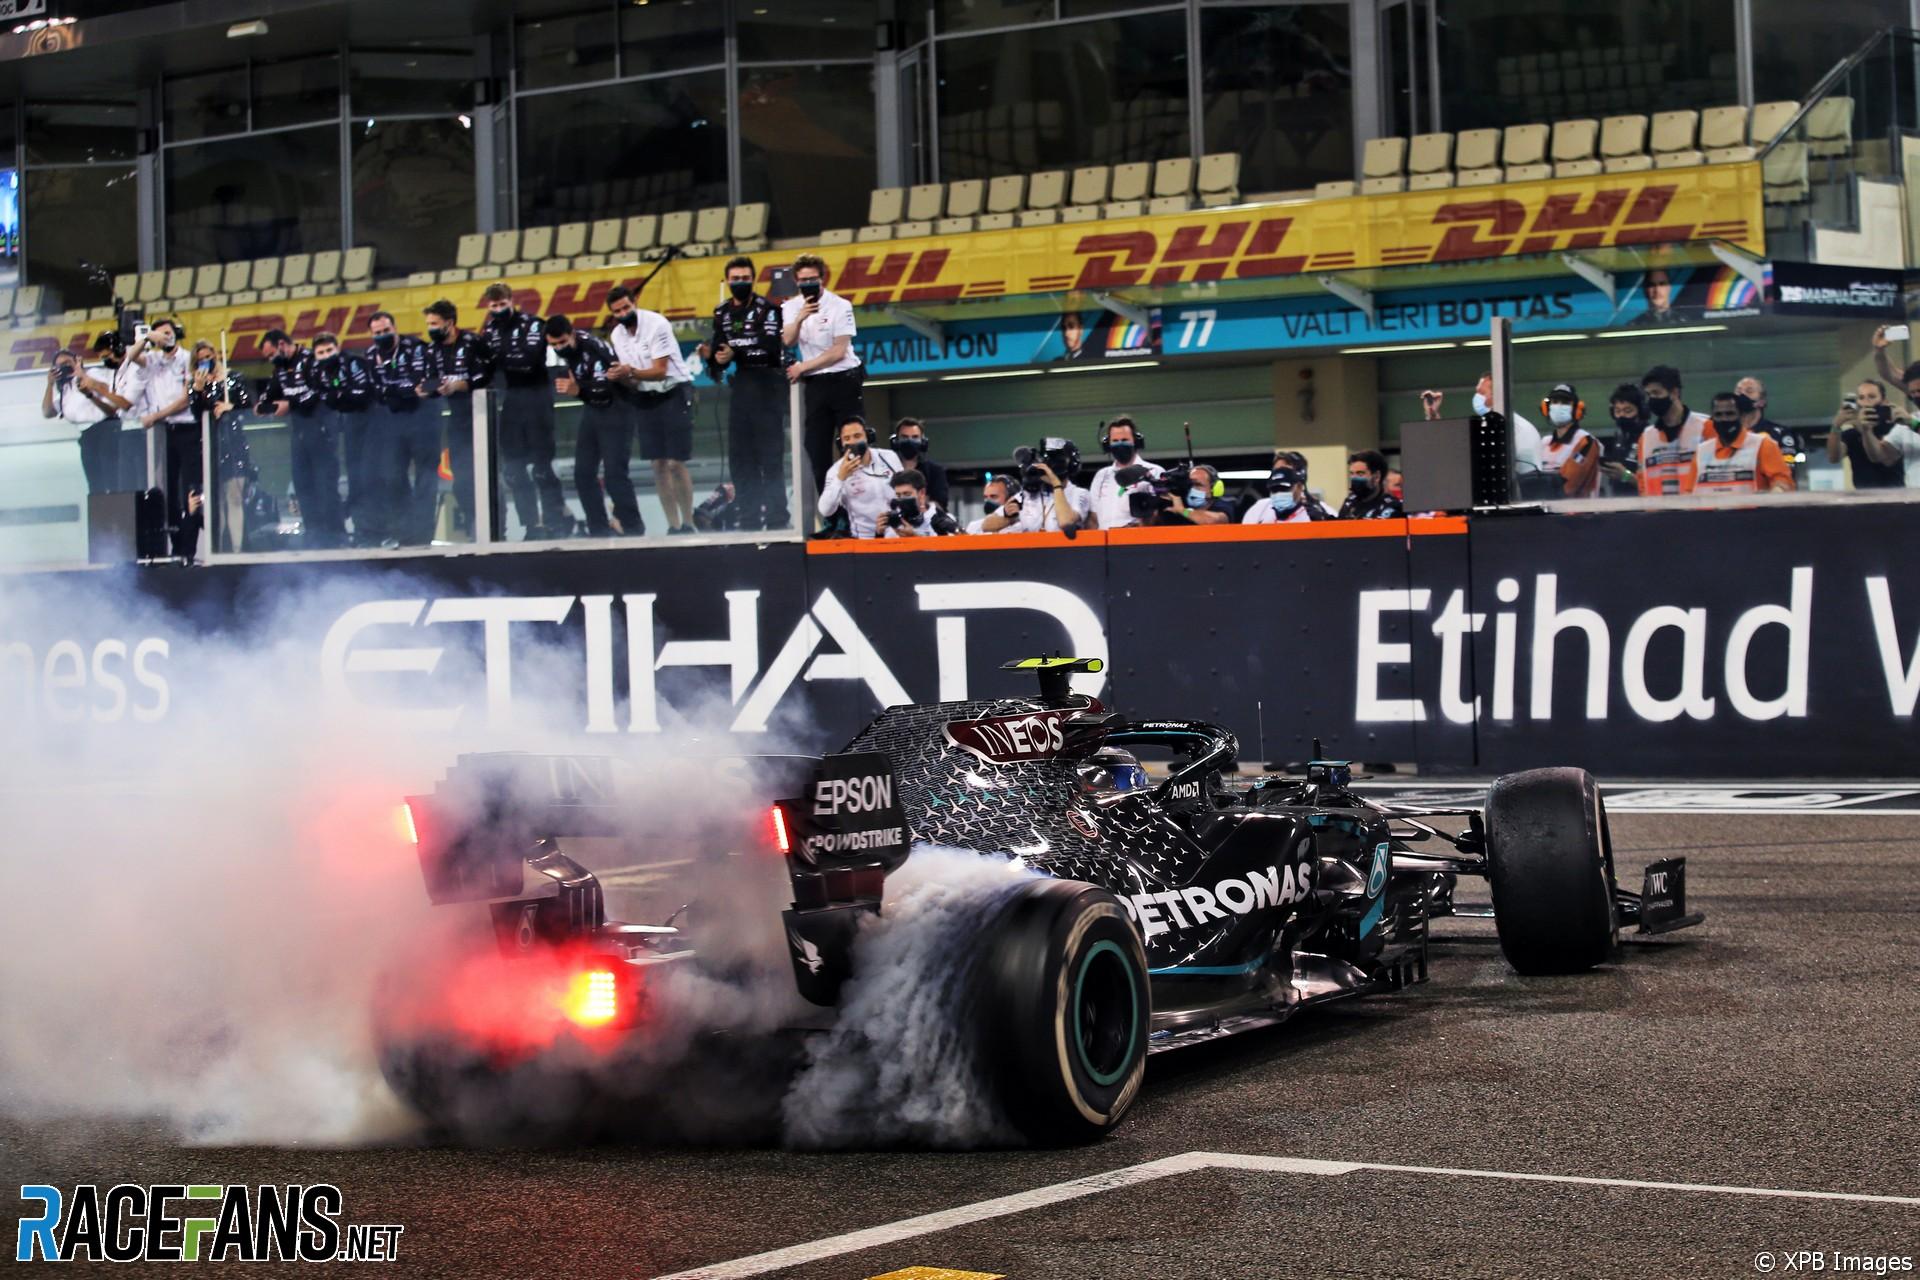 Valtteri Bottas, Mercedes, Yas Marina, 2020